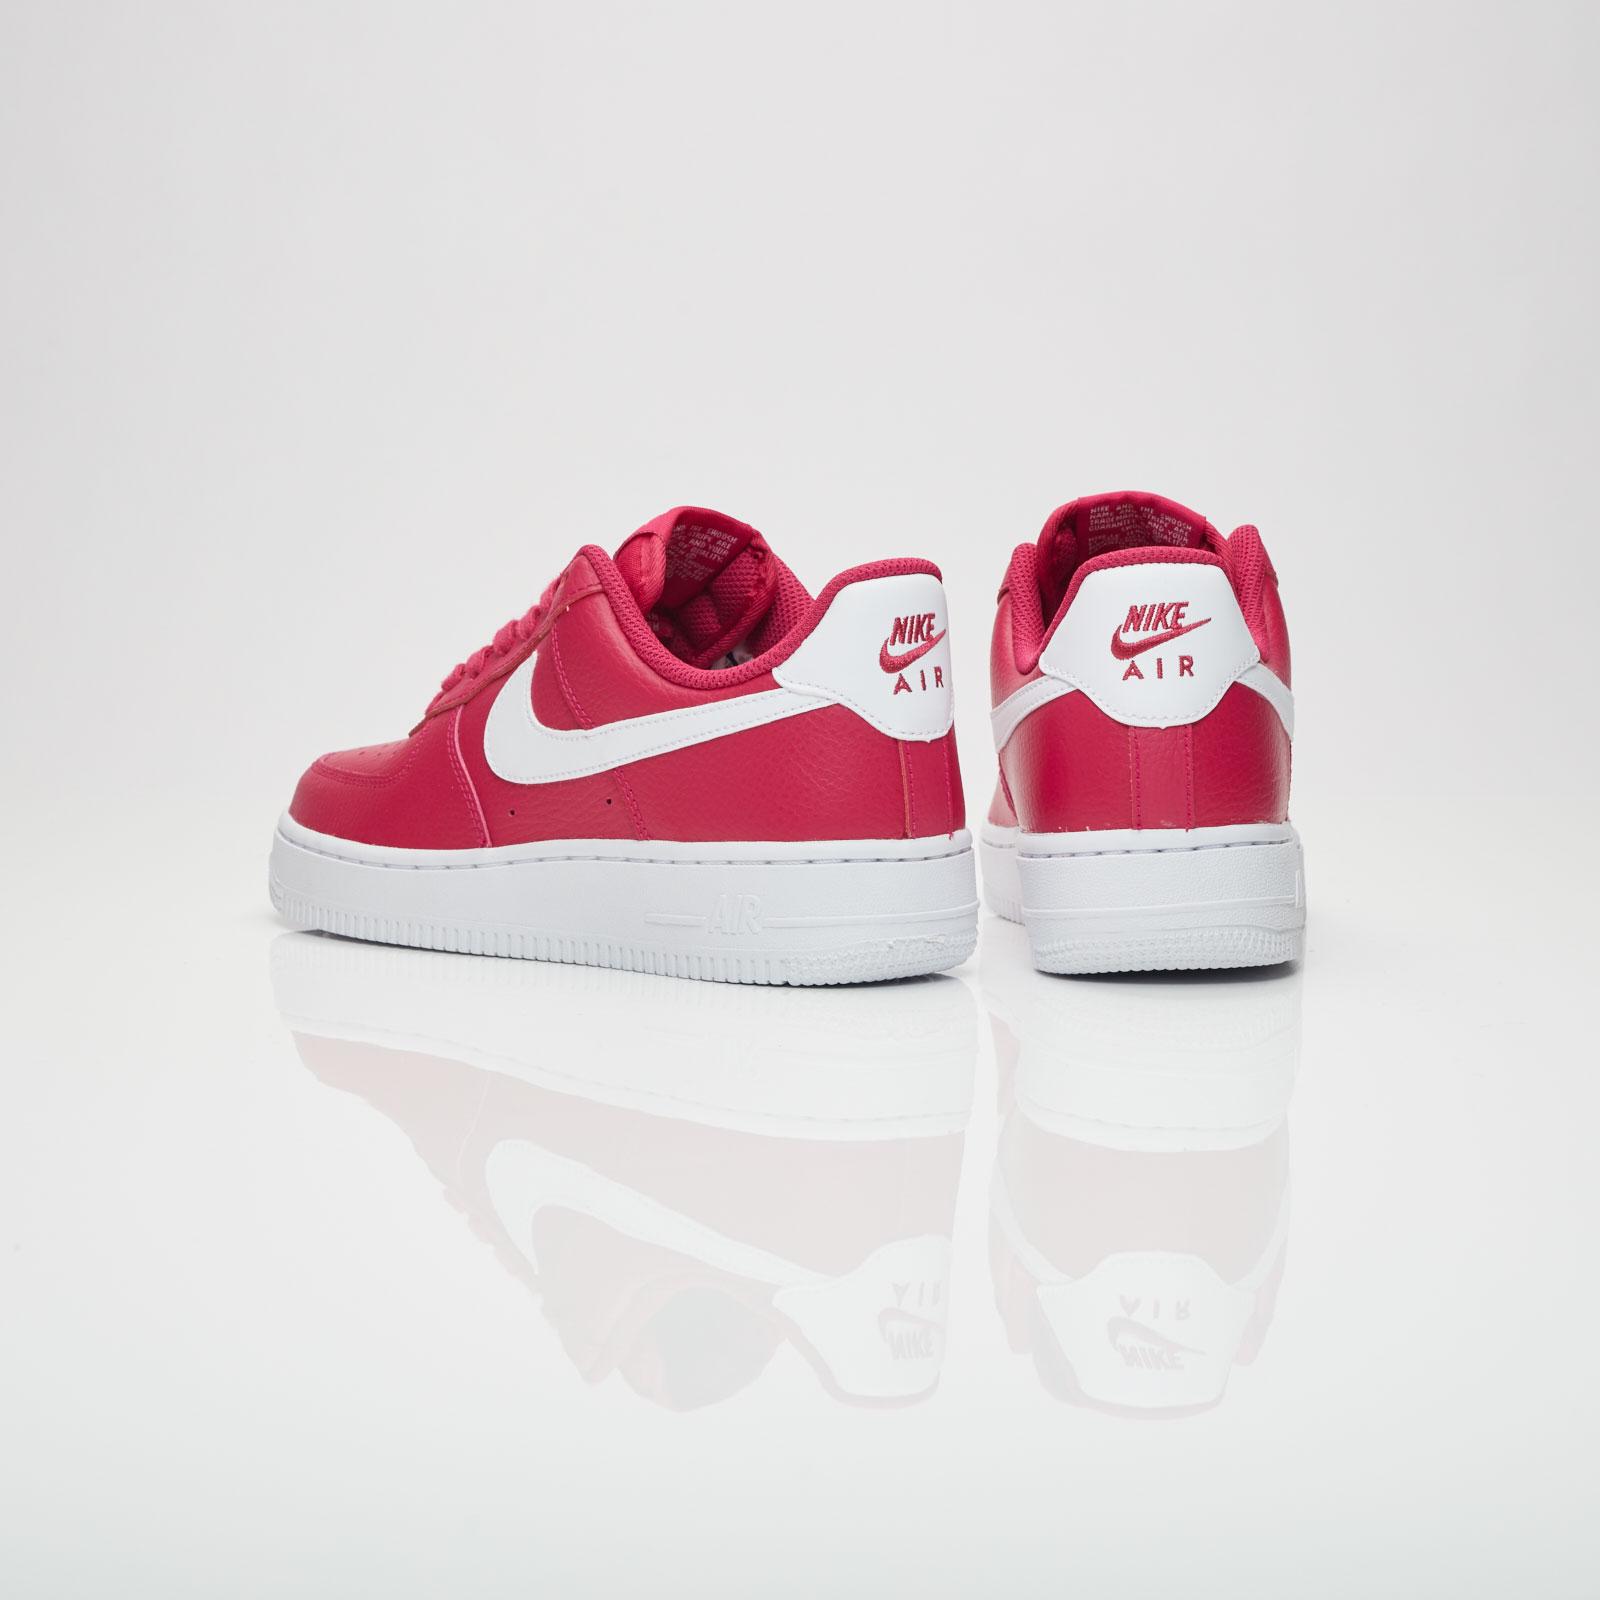 Nike Wmns Air Force 1 07 SE - 896184-600 - Sneakersnstuff  e618ee3b52